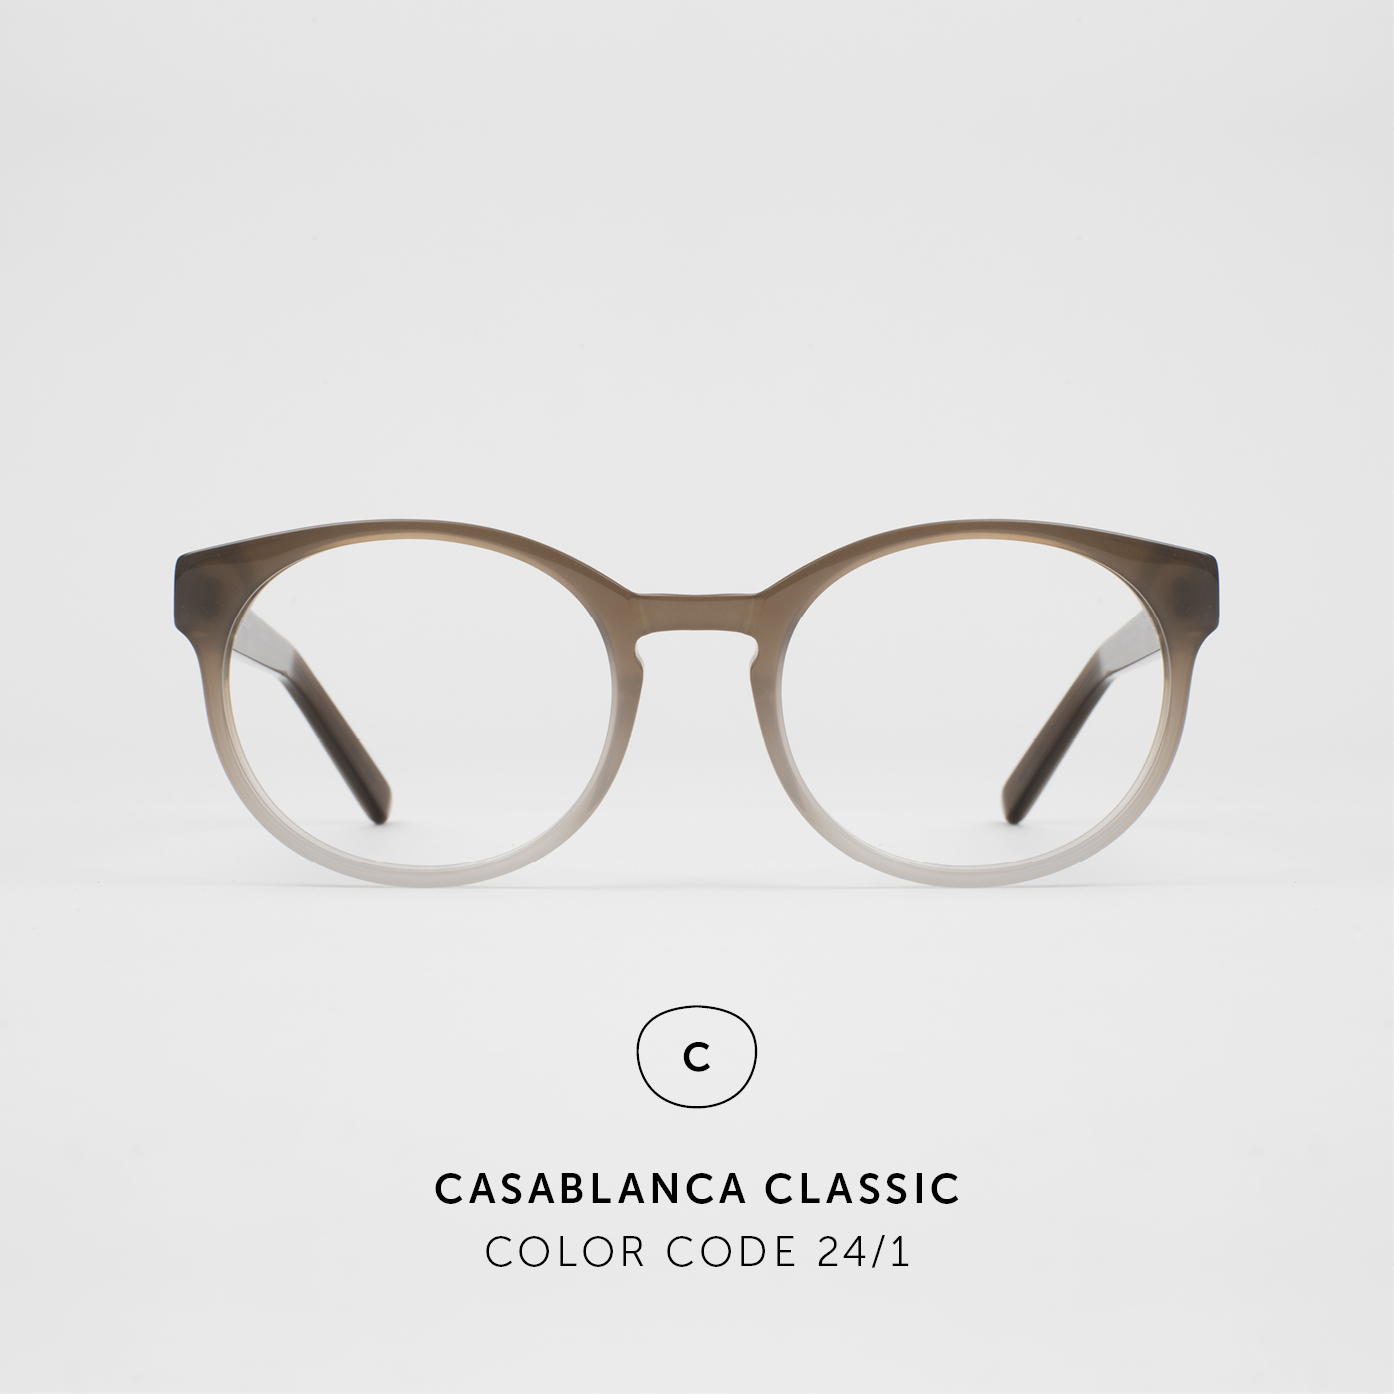 CasablancaClassic57.jpg